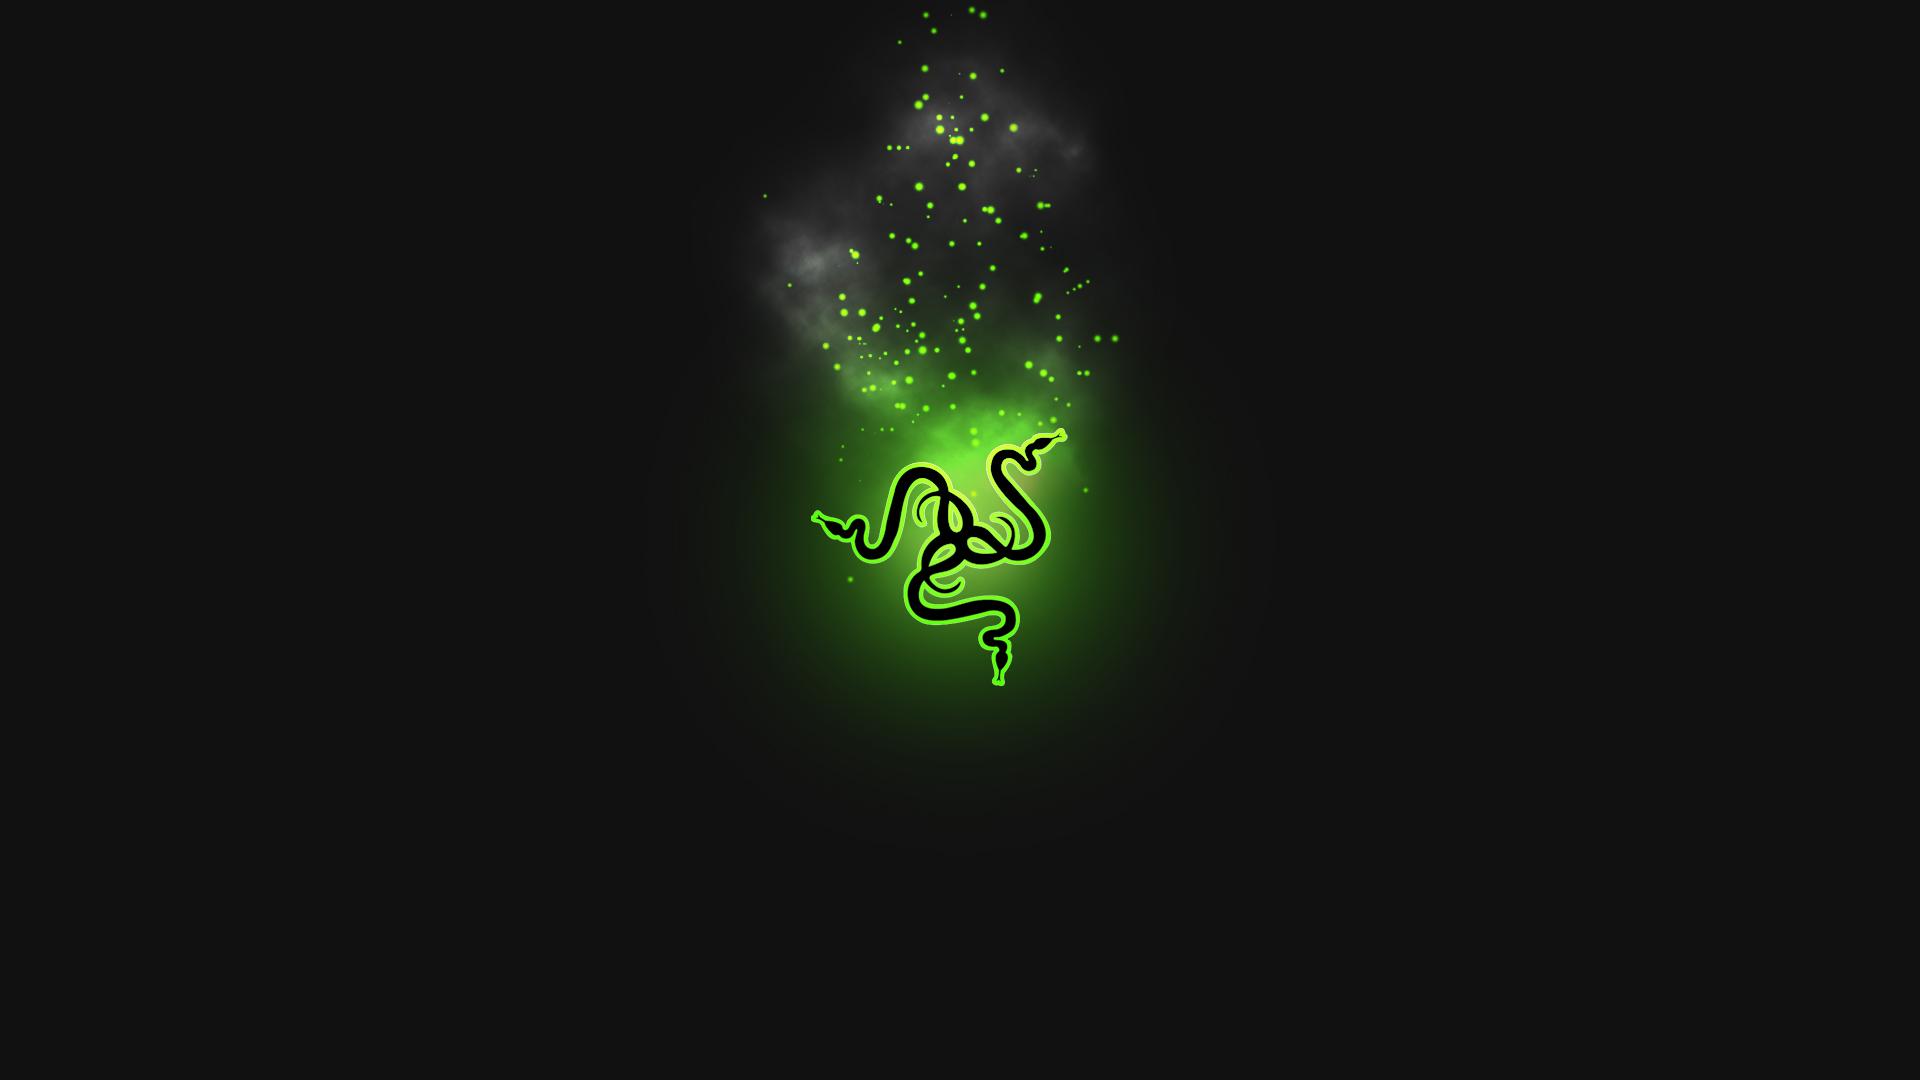 virus laptop background